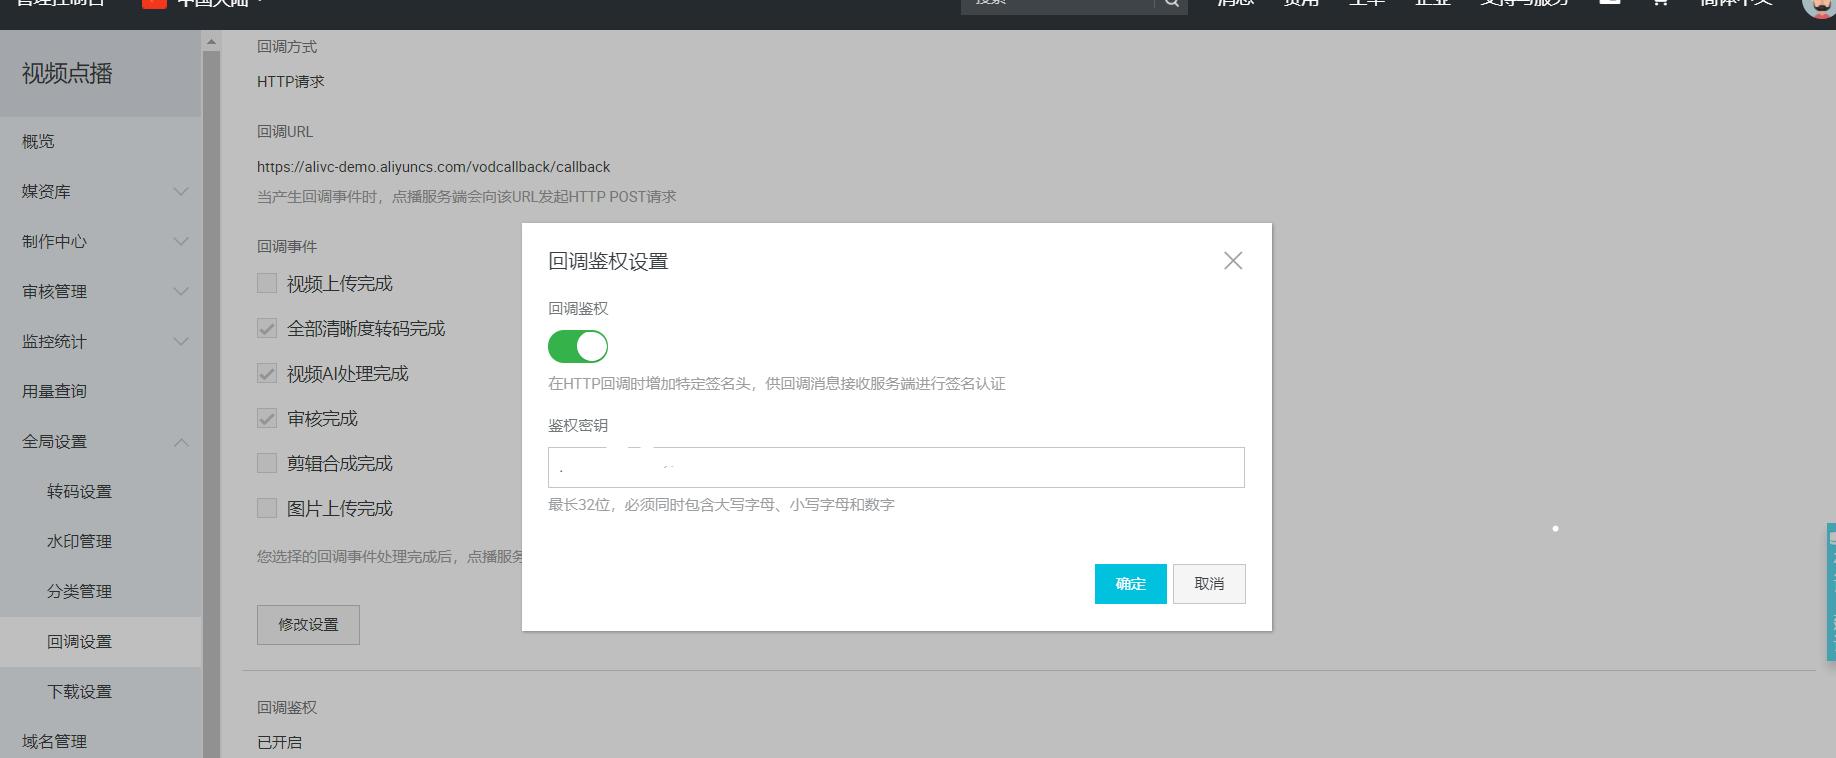 Configure callback authentication